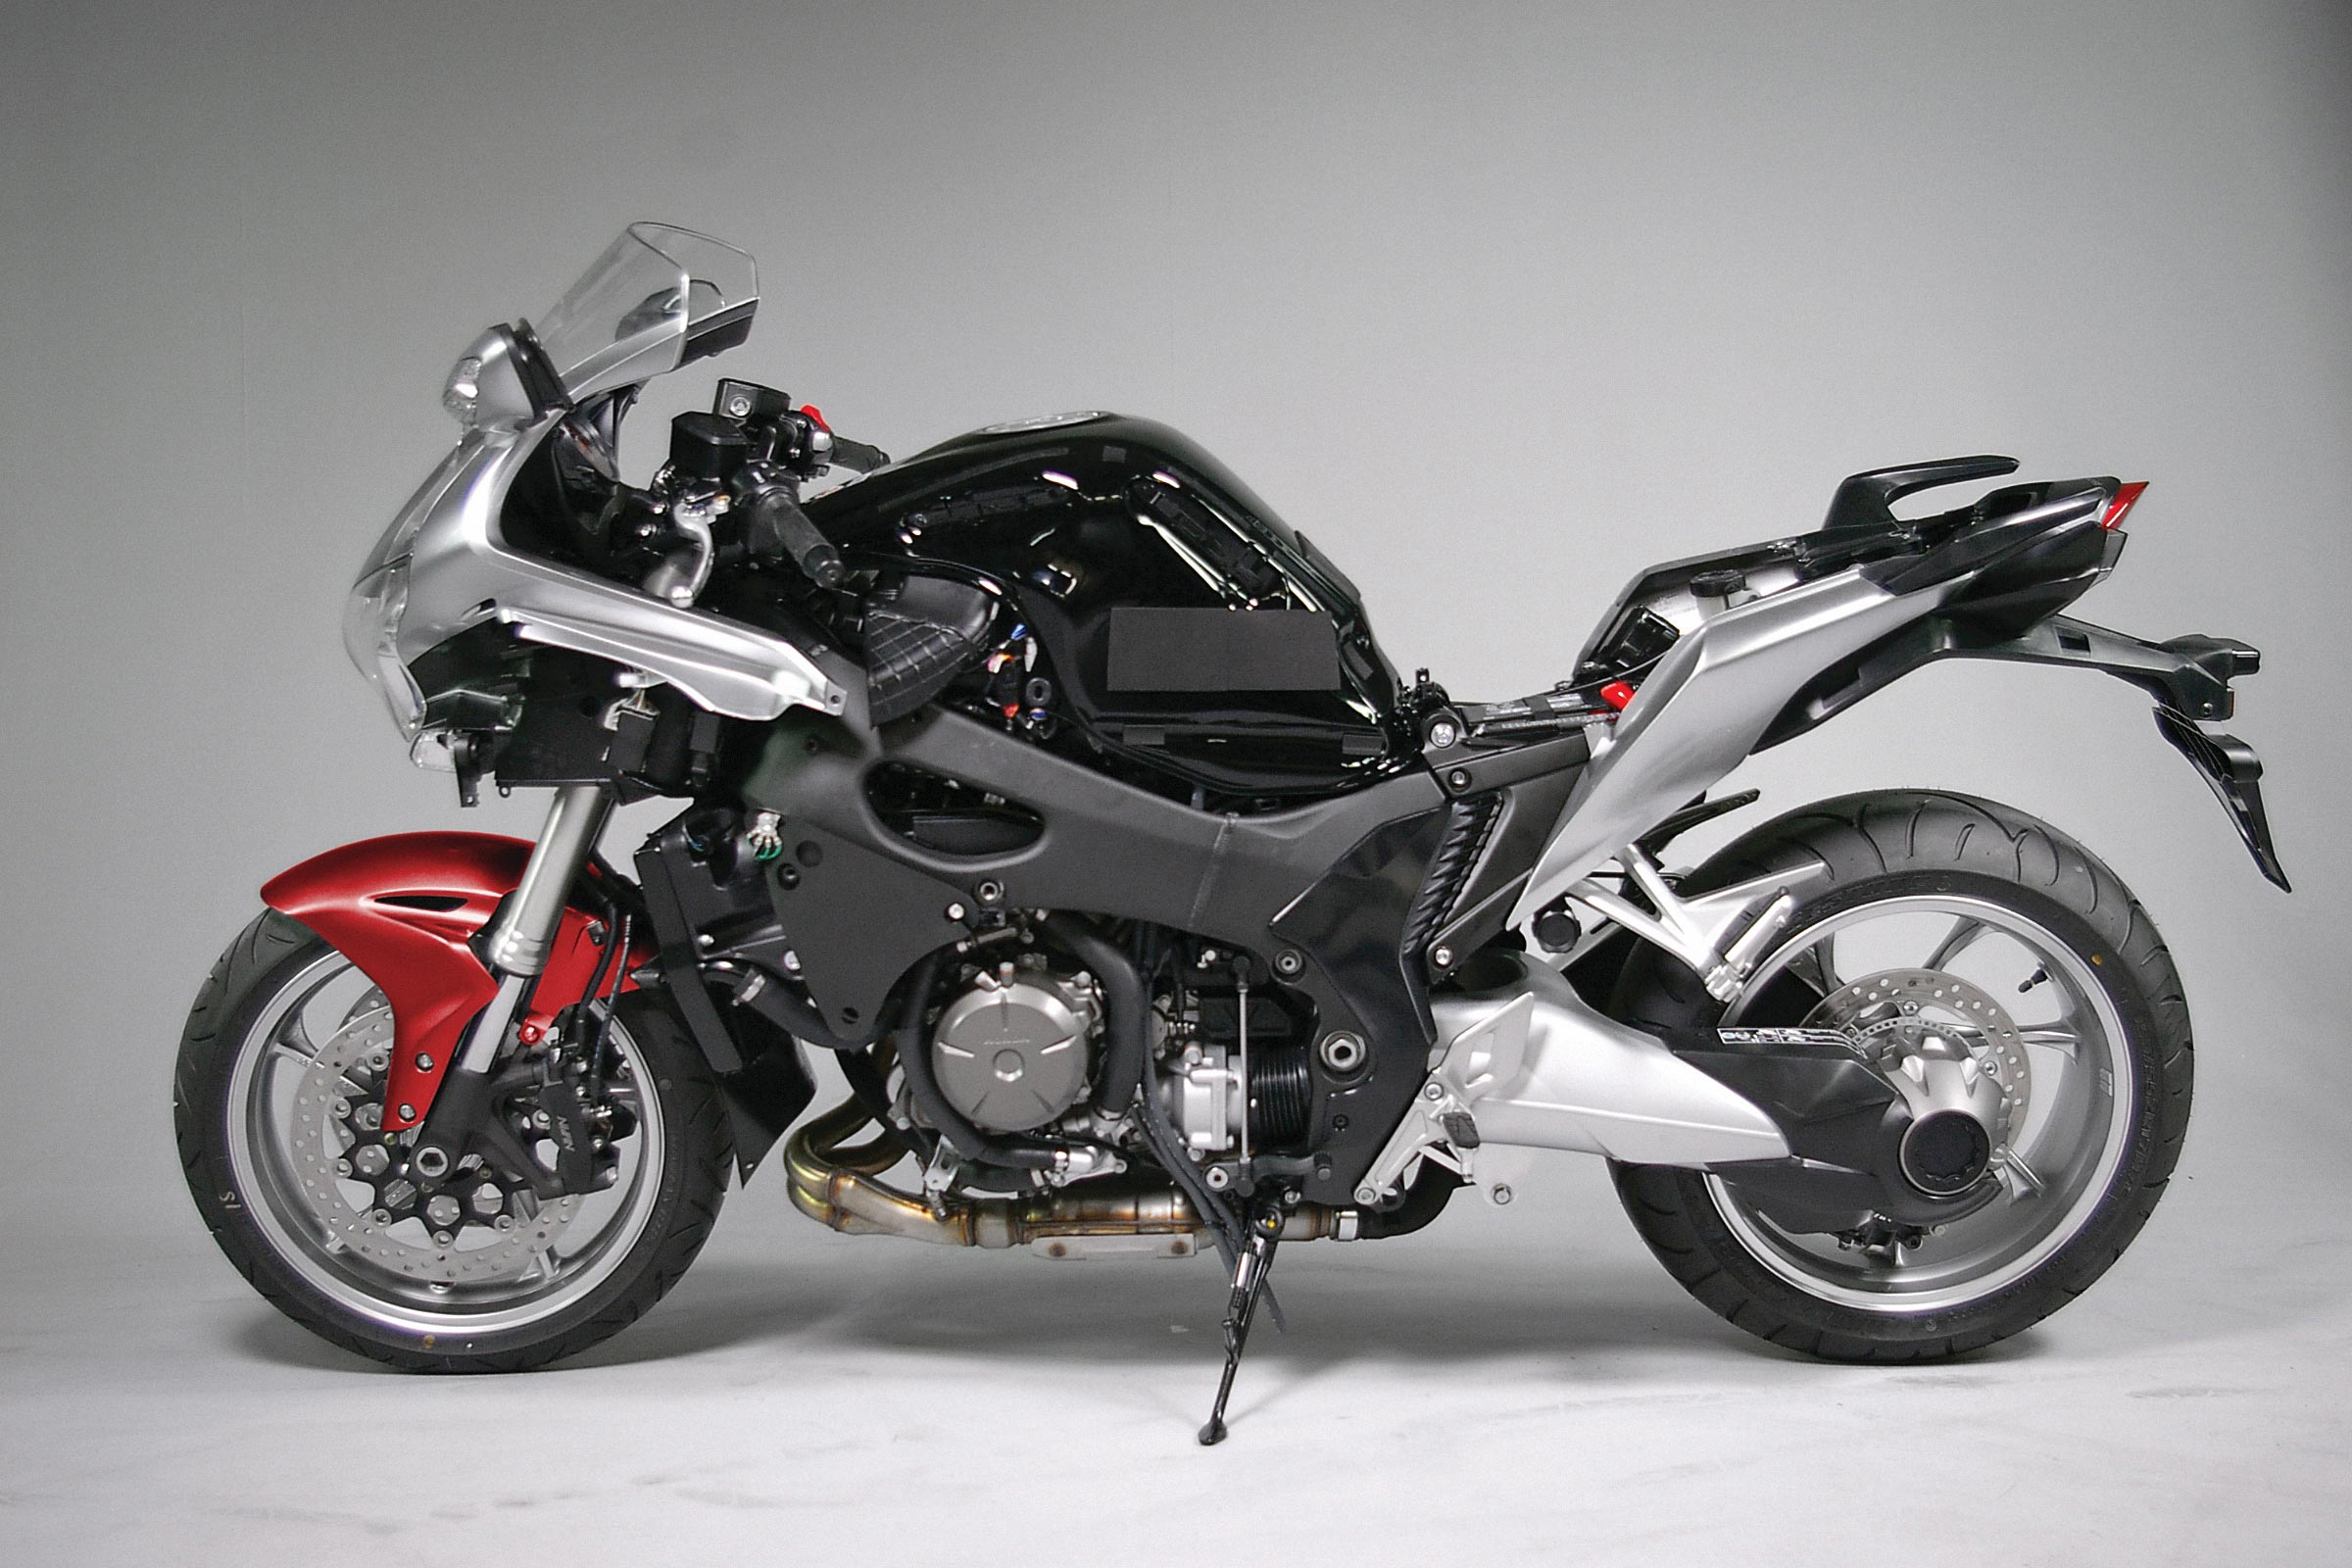 Мотоциклы и скутеры - Powered by vBulletin